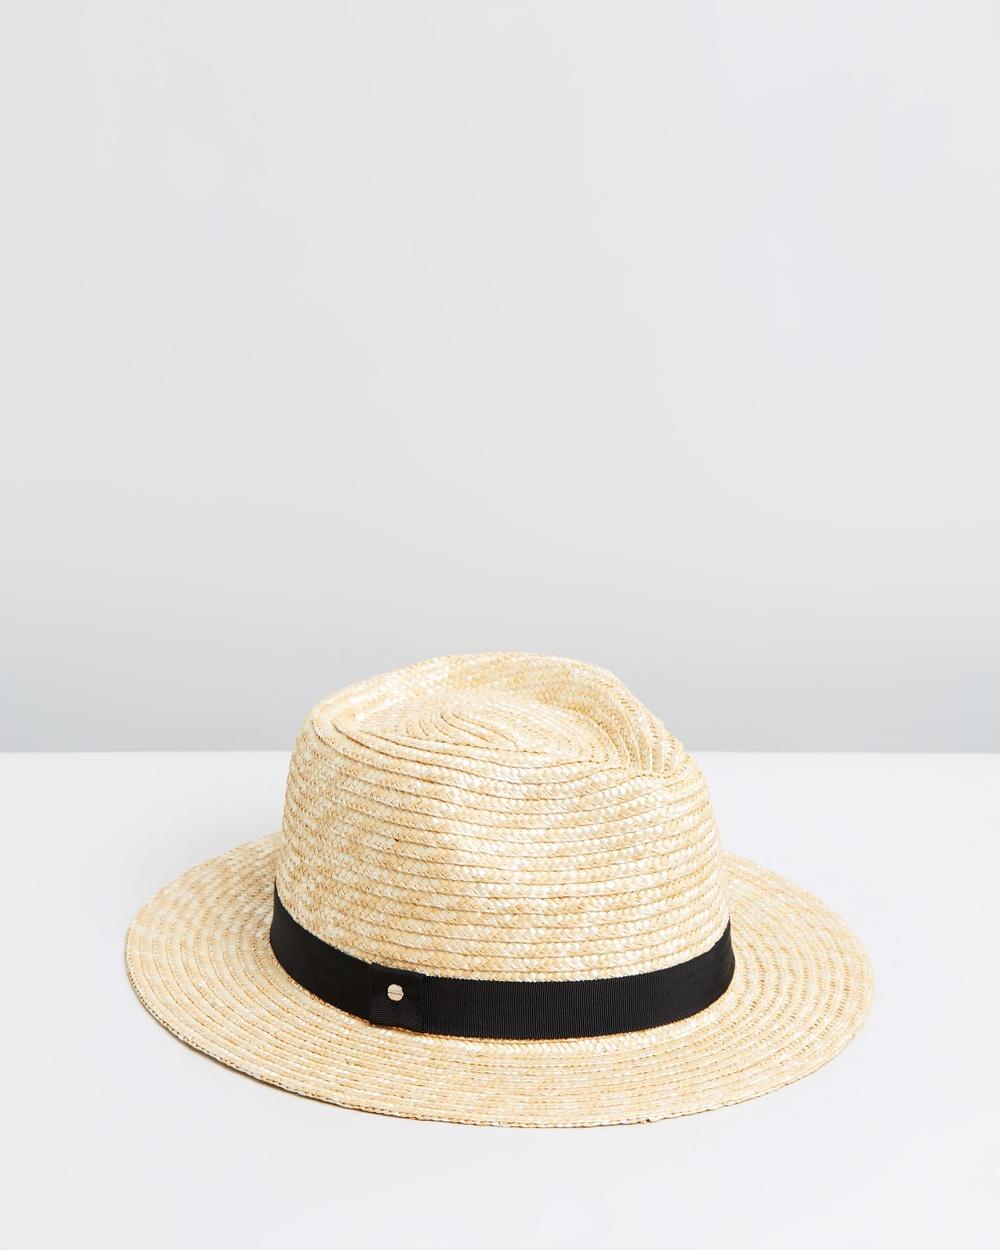 Ace Of Something Eros Straw Fedora Hats Natural & Black